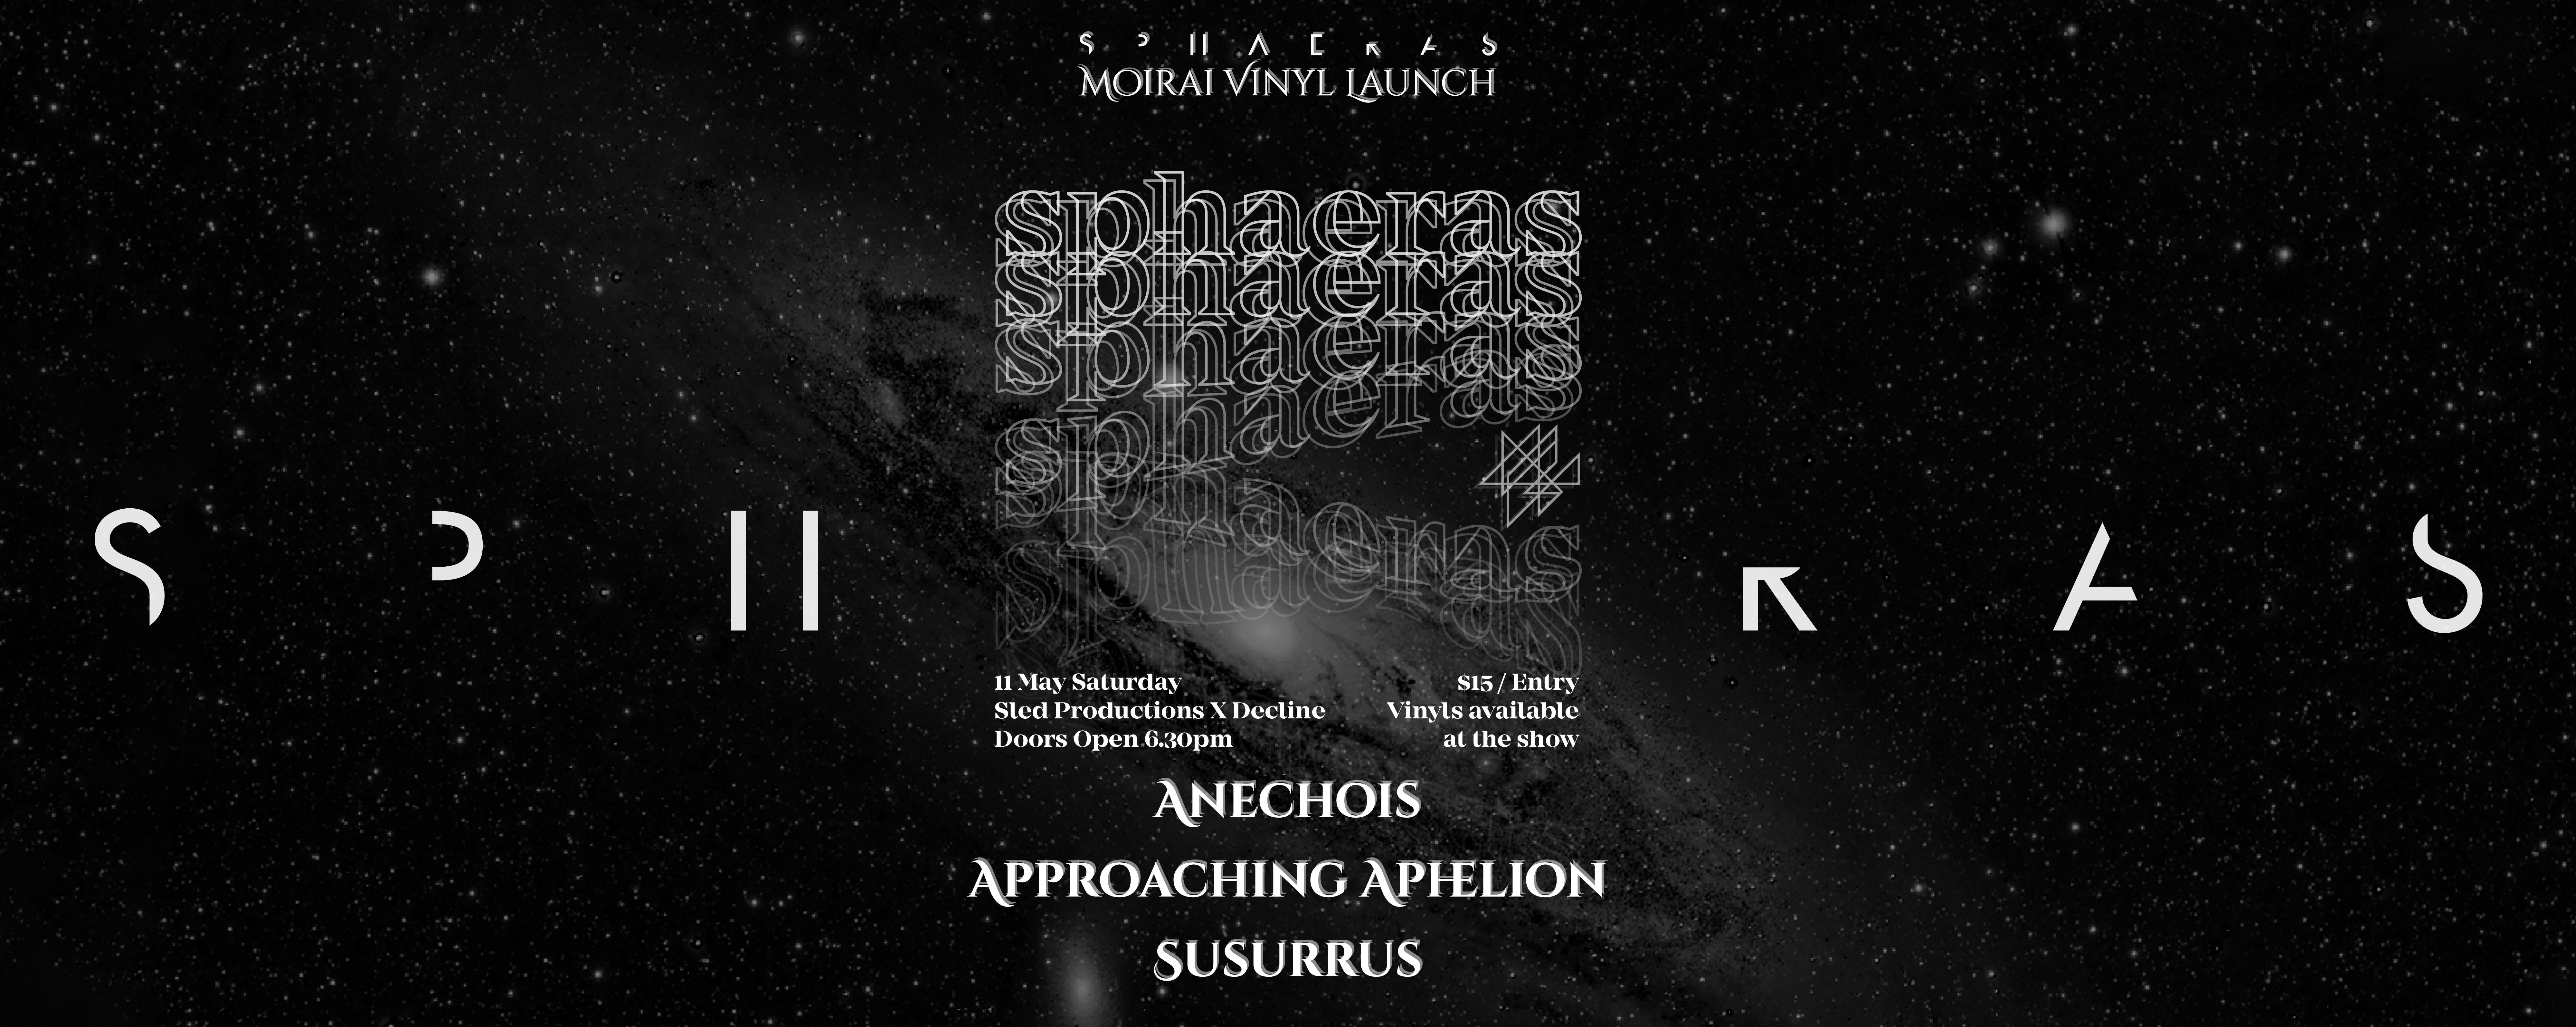 Sphaeras 'Moirai' Vinyl Launch